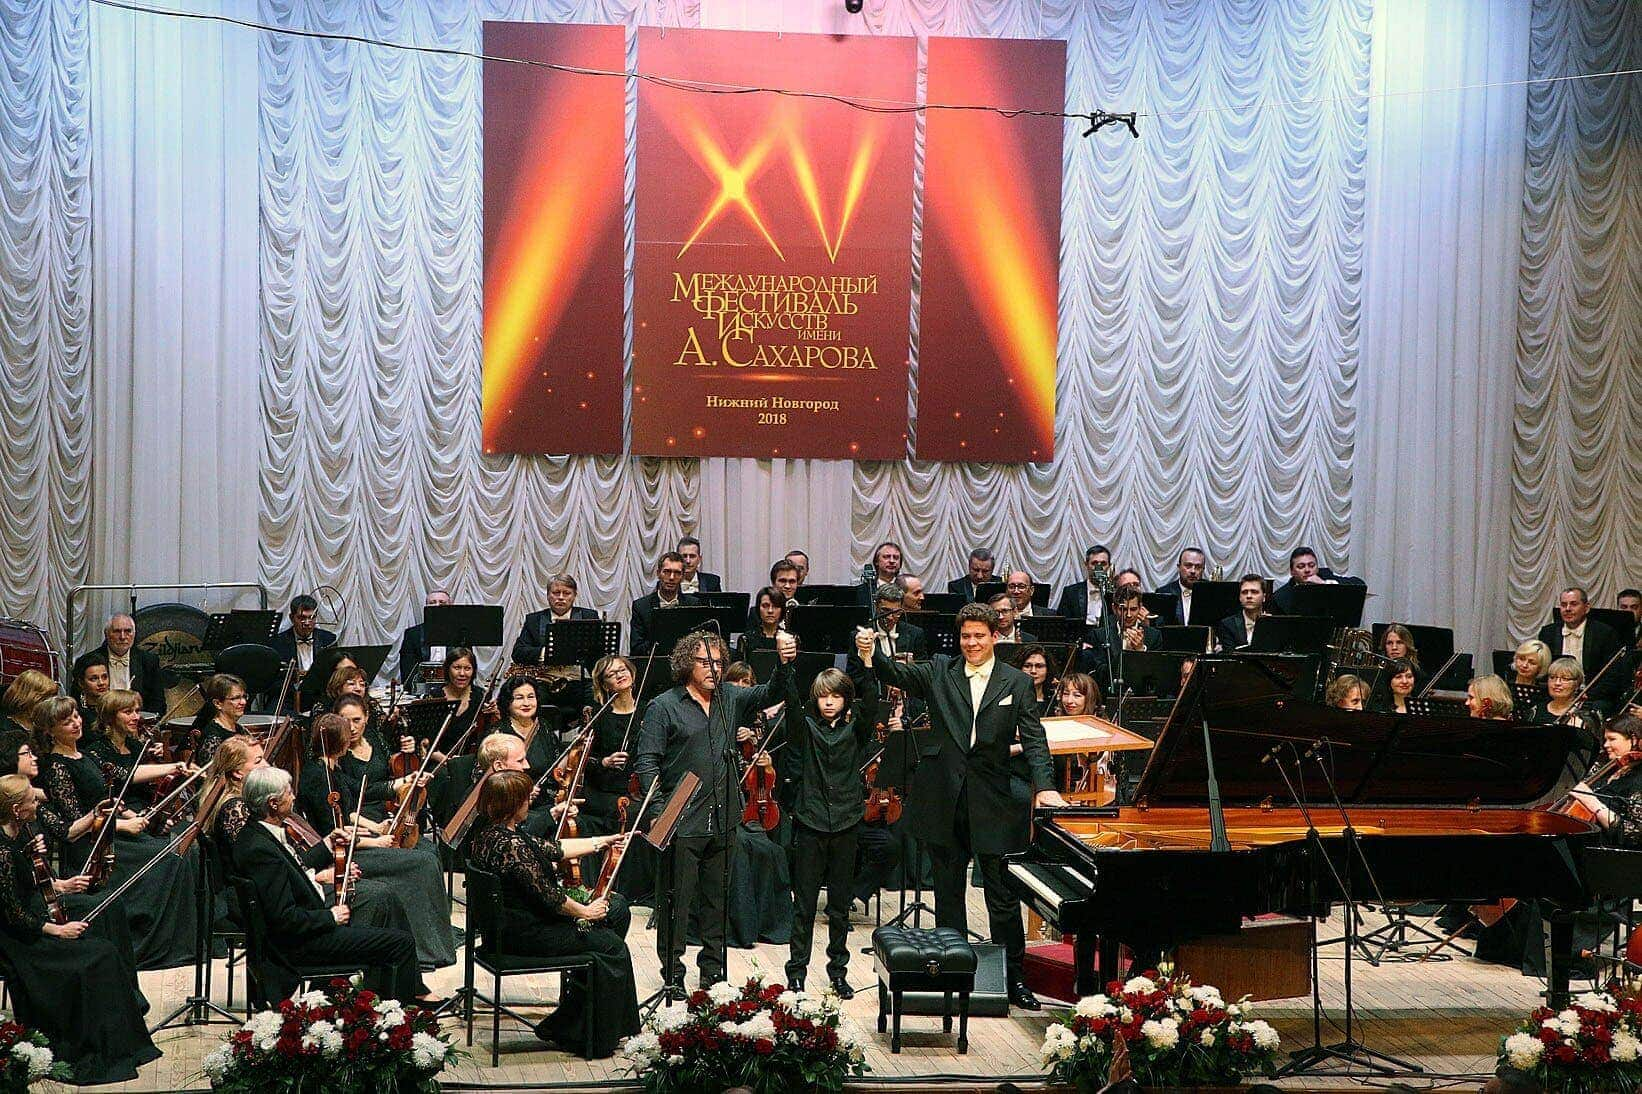 XV Международный фестиваль искусств им. А. Д. Сахарова